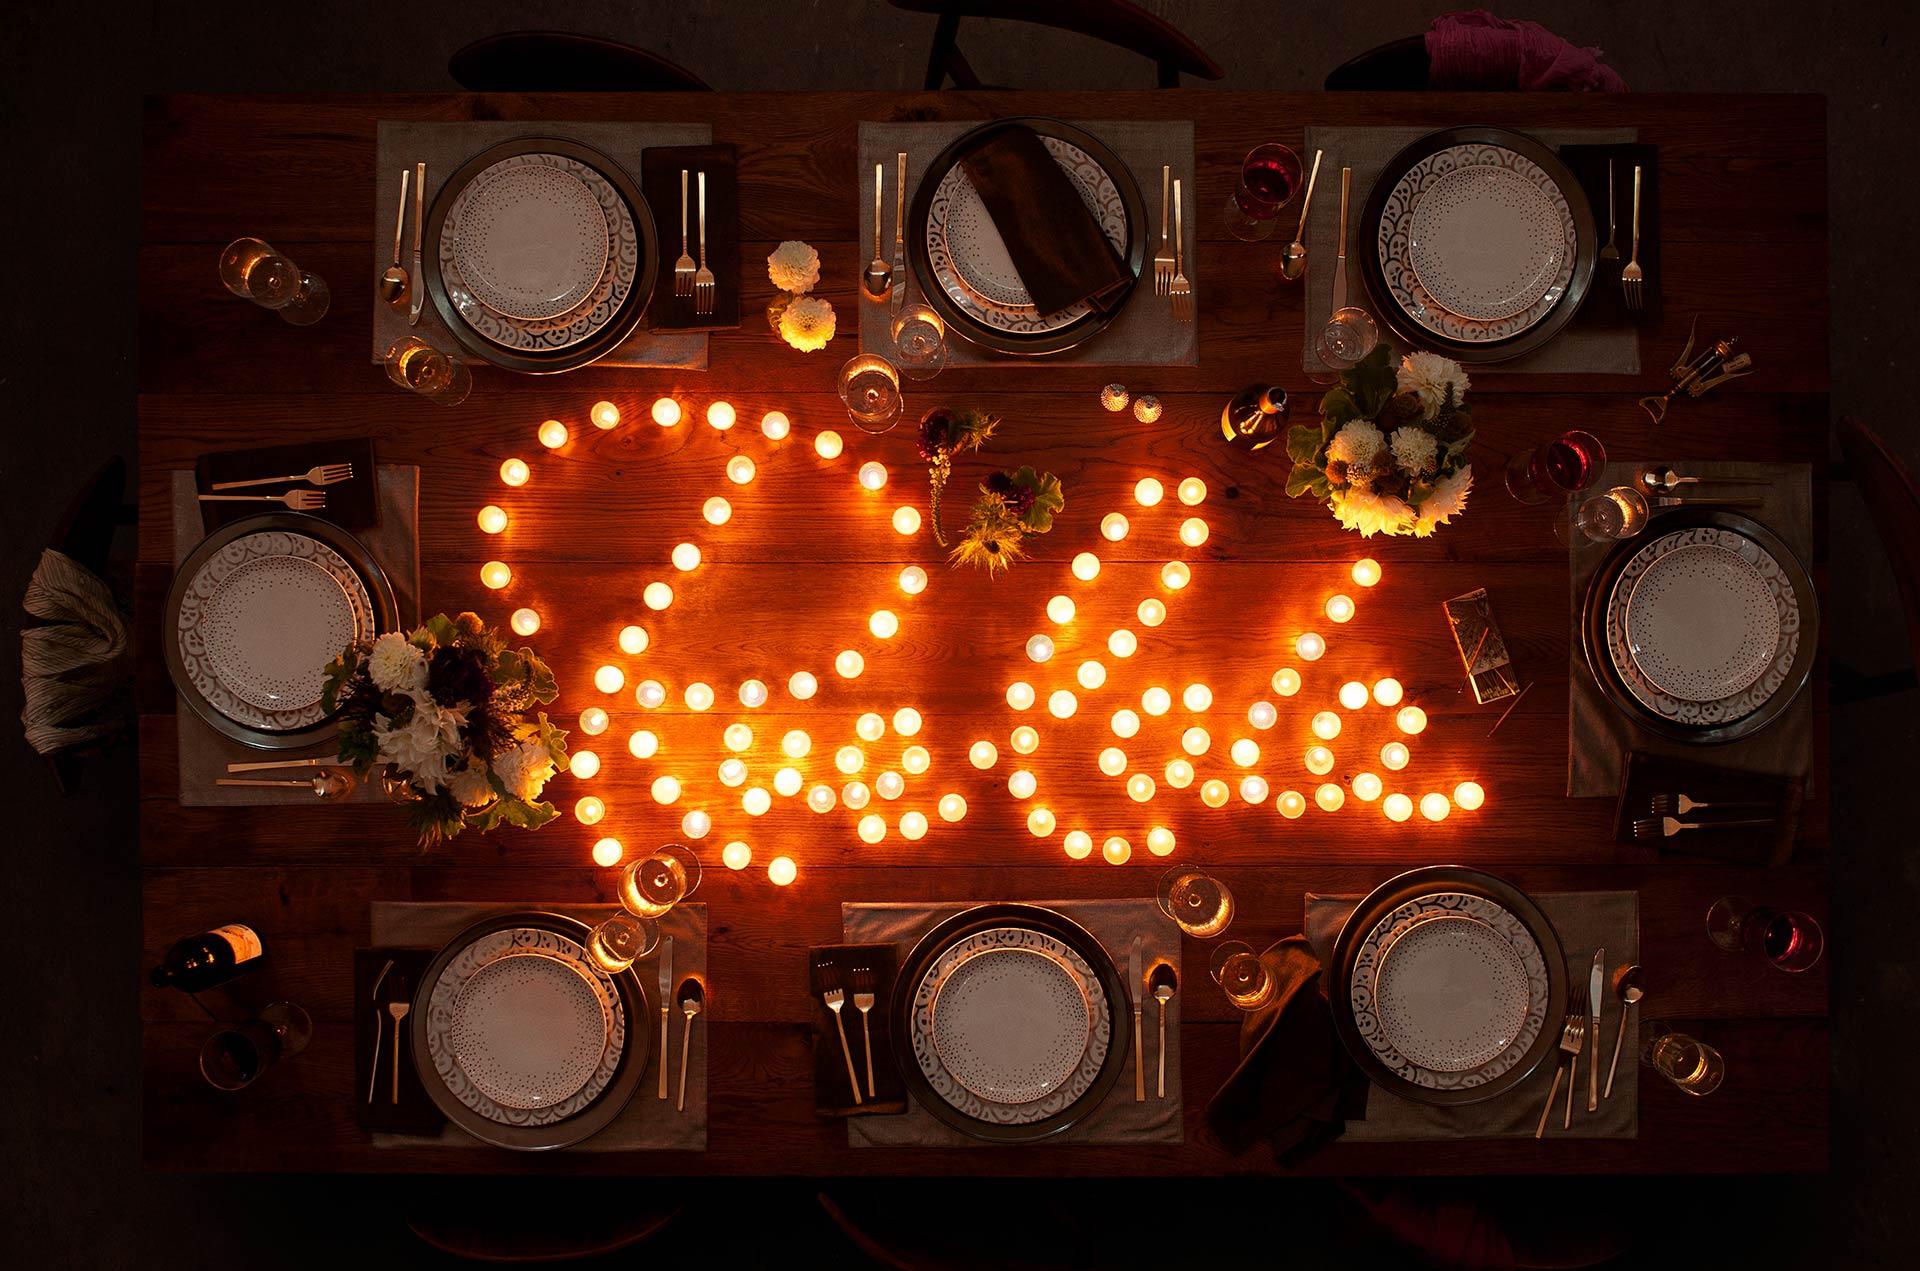 6218_RueLaLa_Candles_RGB_josh.jpg